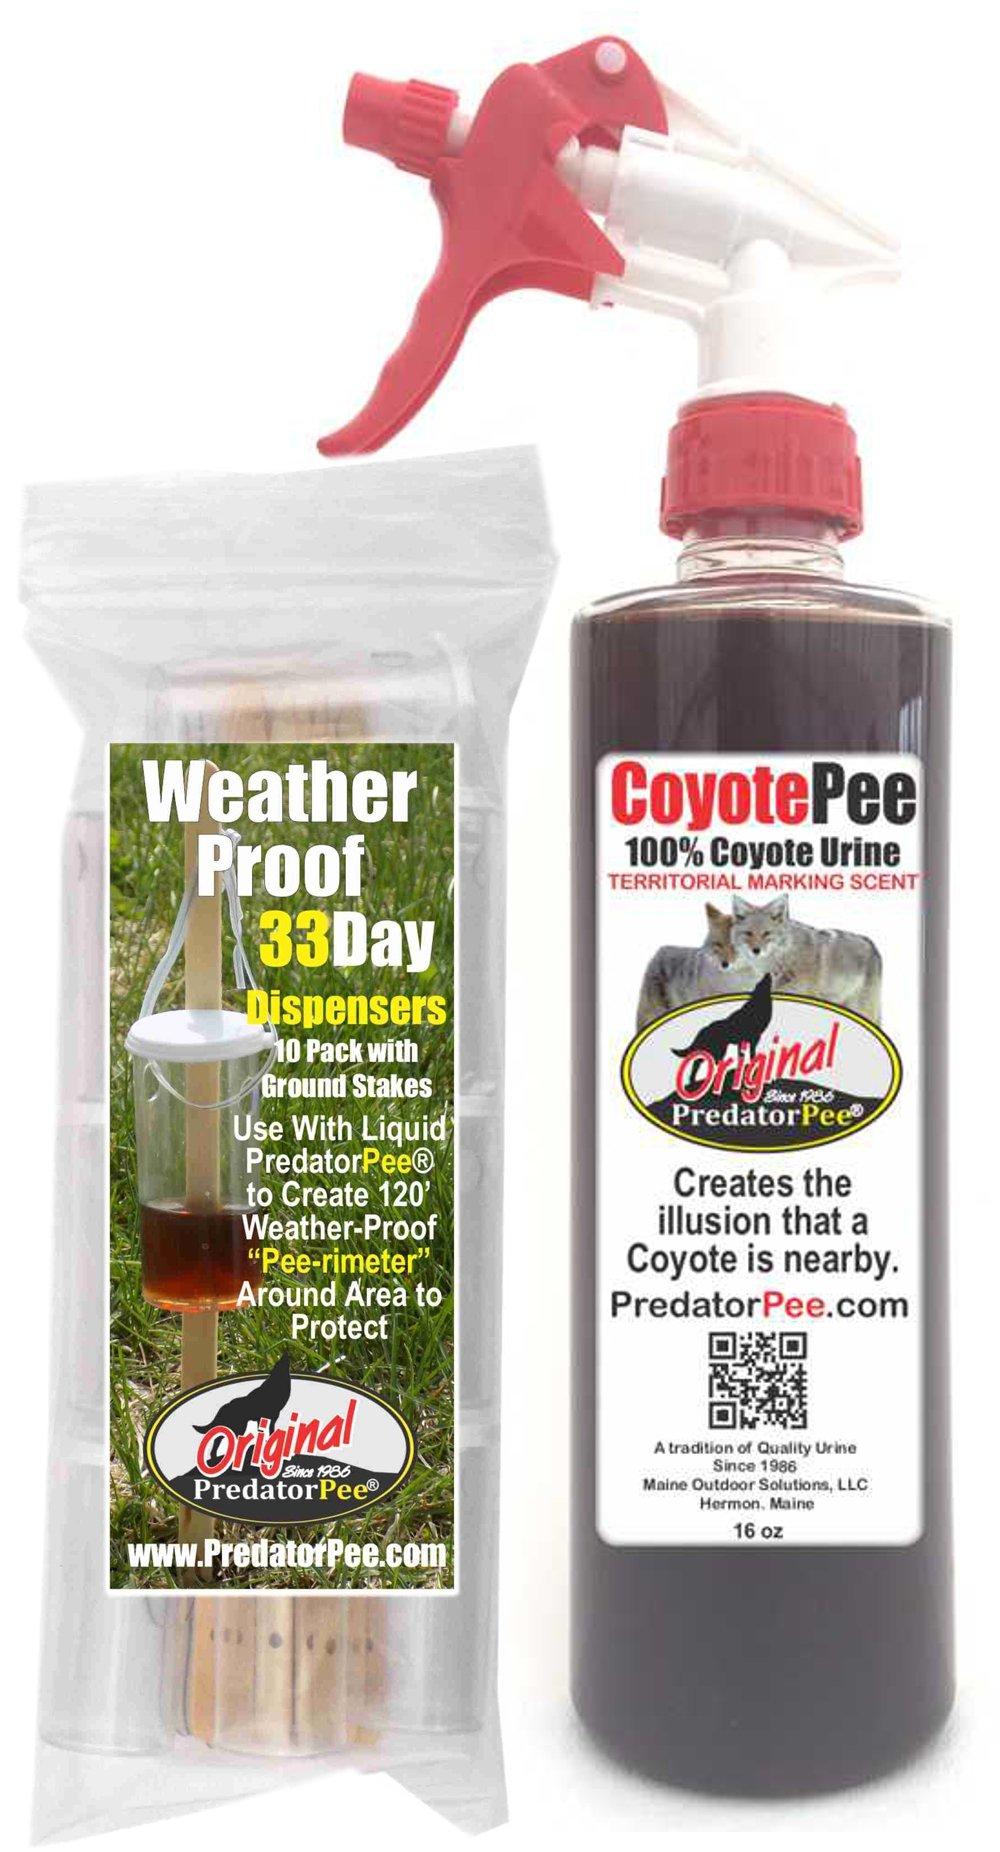 PredatorPee - 100% Pure Coyote Urine - 16oz Spray Bottle Combo with 33 Day Dispensers by PredatorPee